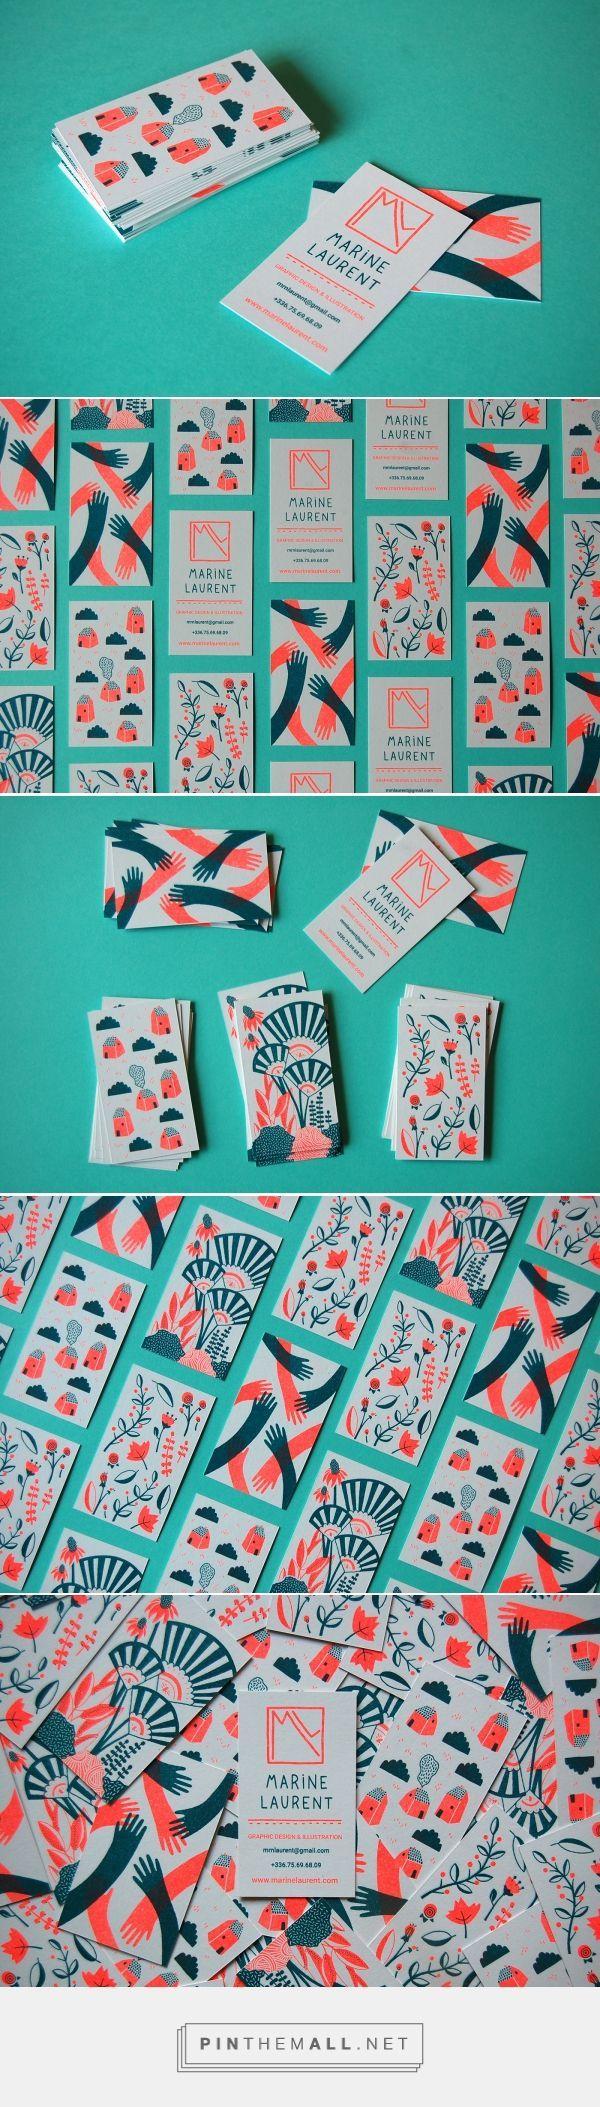 Marine Laurent Business Card Design (Designer Unkown) | Fivestar Branding Agency – Design and Branding Agency & Curated Inspiration Gallery